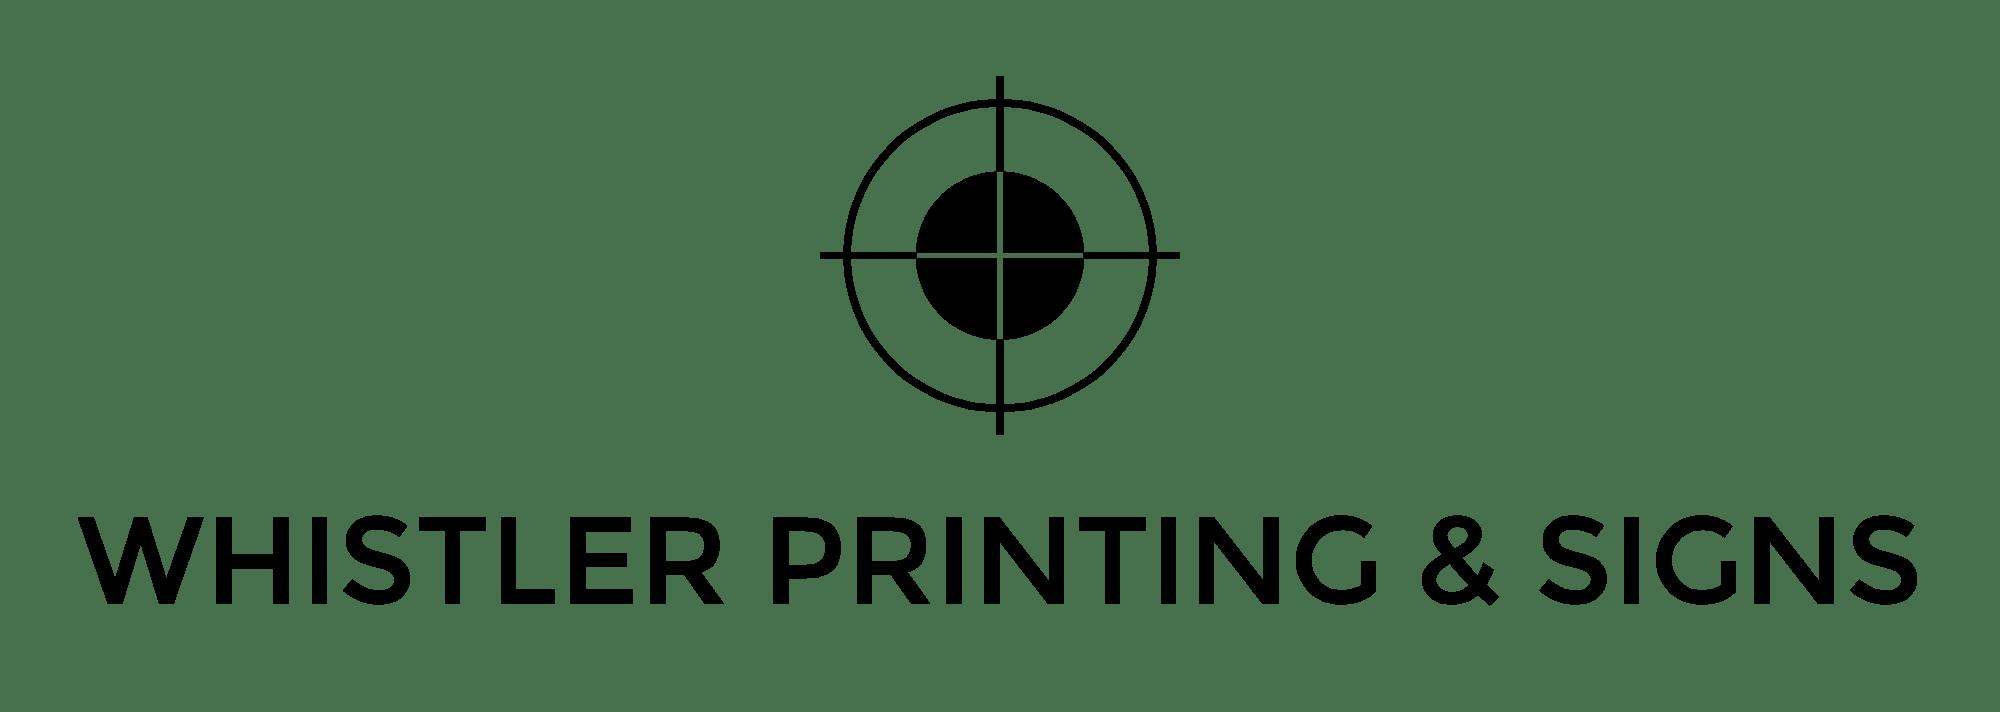 Whistler Printing & Signs Ltd.